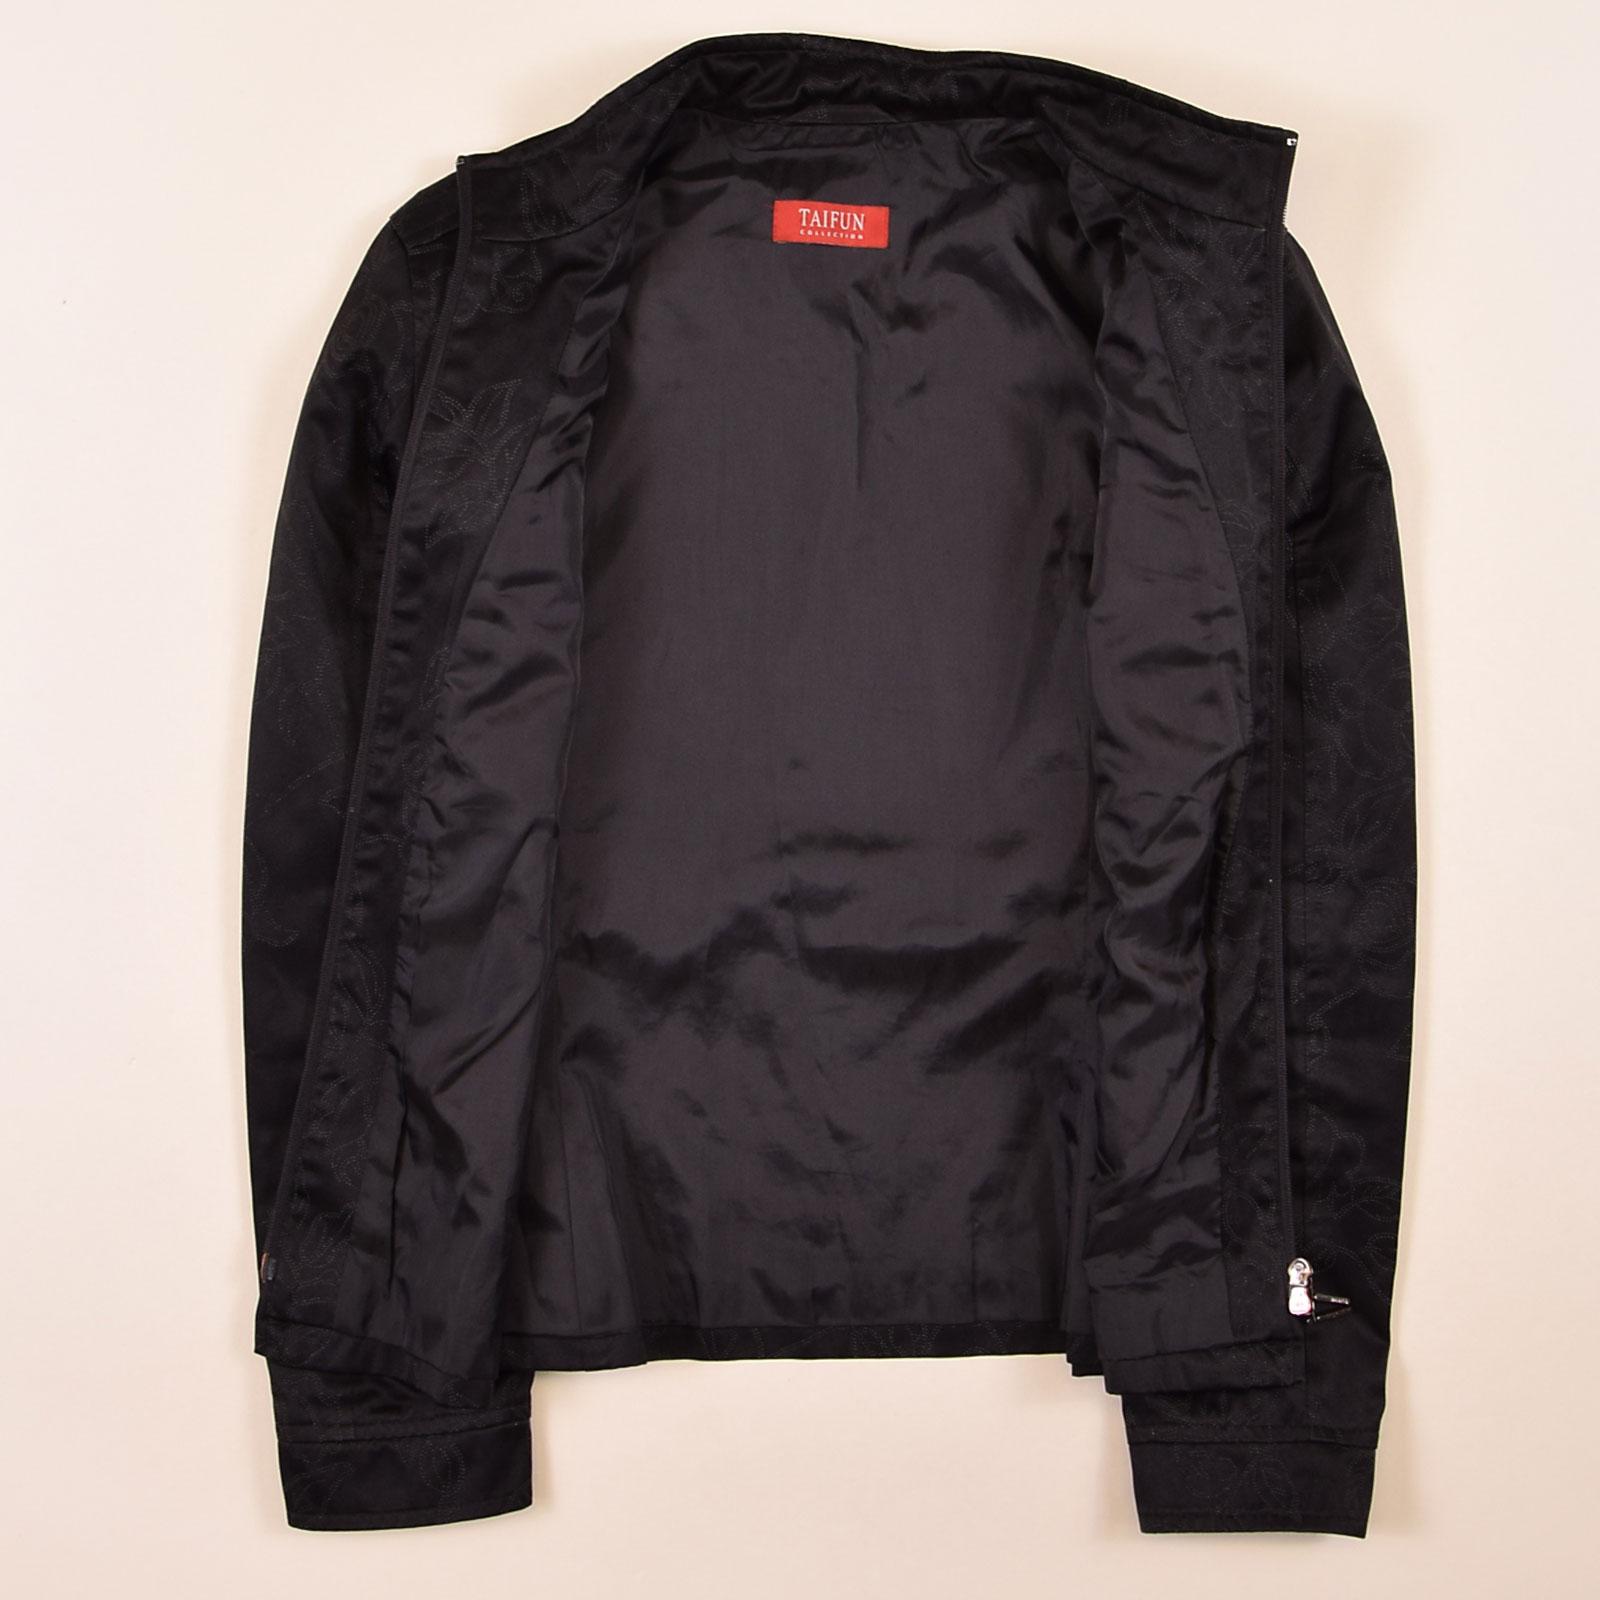 Taifun Damen Jacke Jacket Gr.40 Schwarz, 68428   eBay